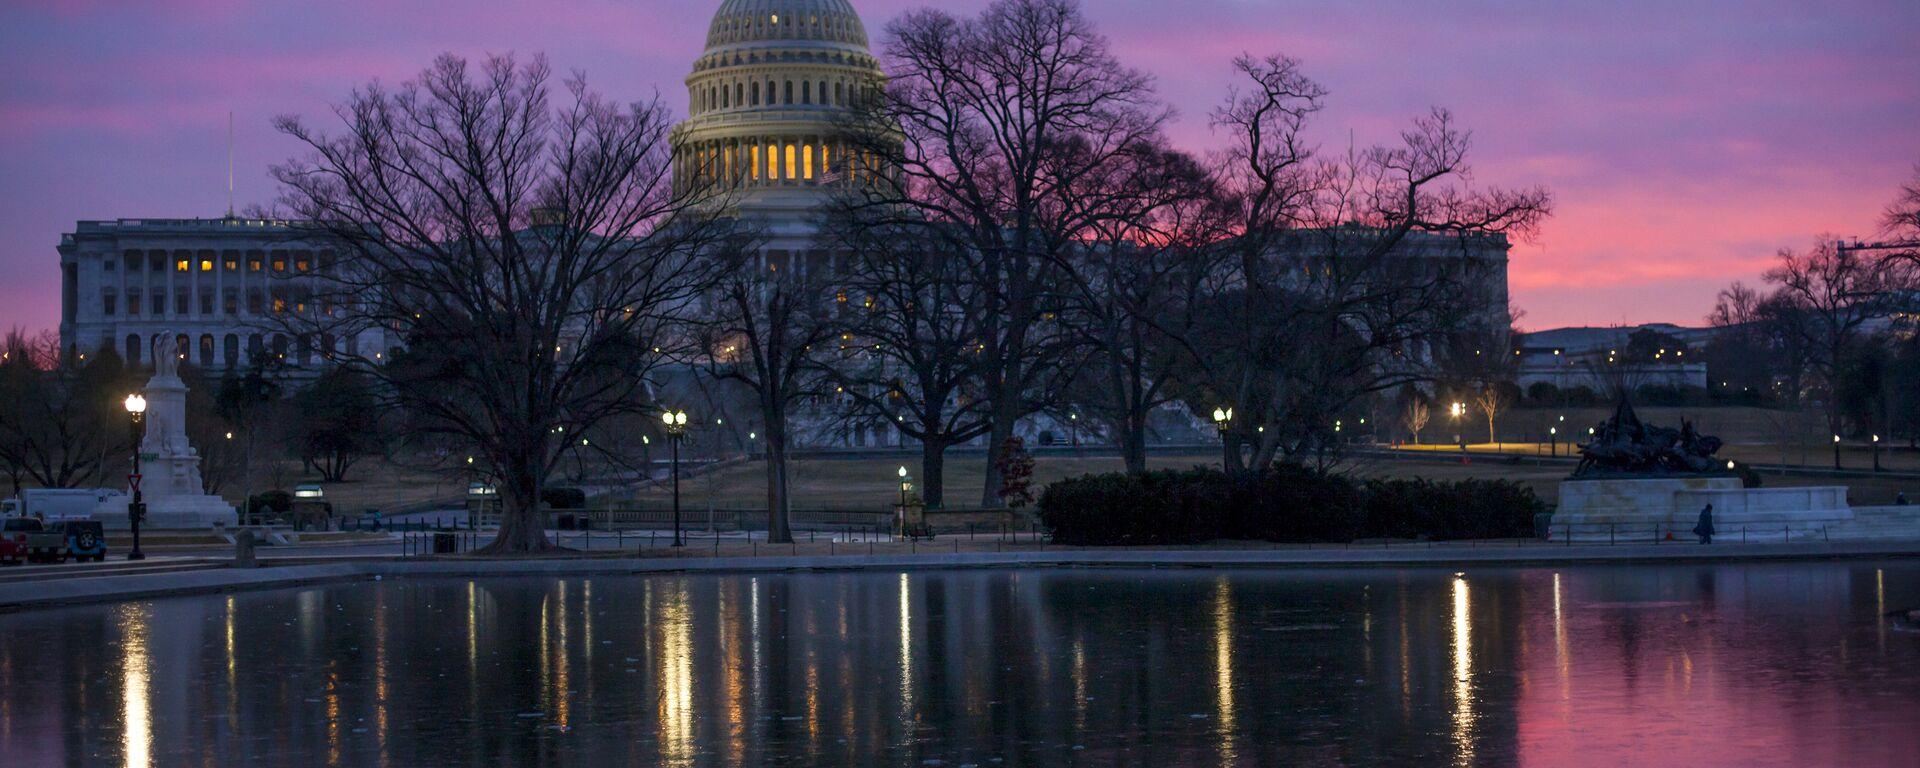 Dawn breaks over the US Capitol building in Washington DC - Sputnik International, 1920, 16.01.2021